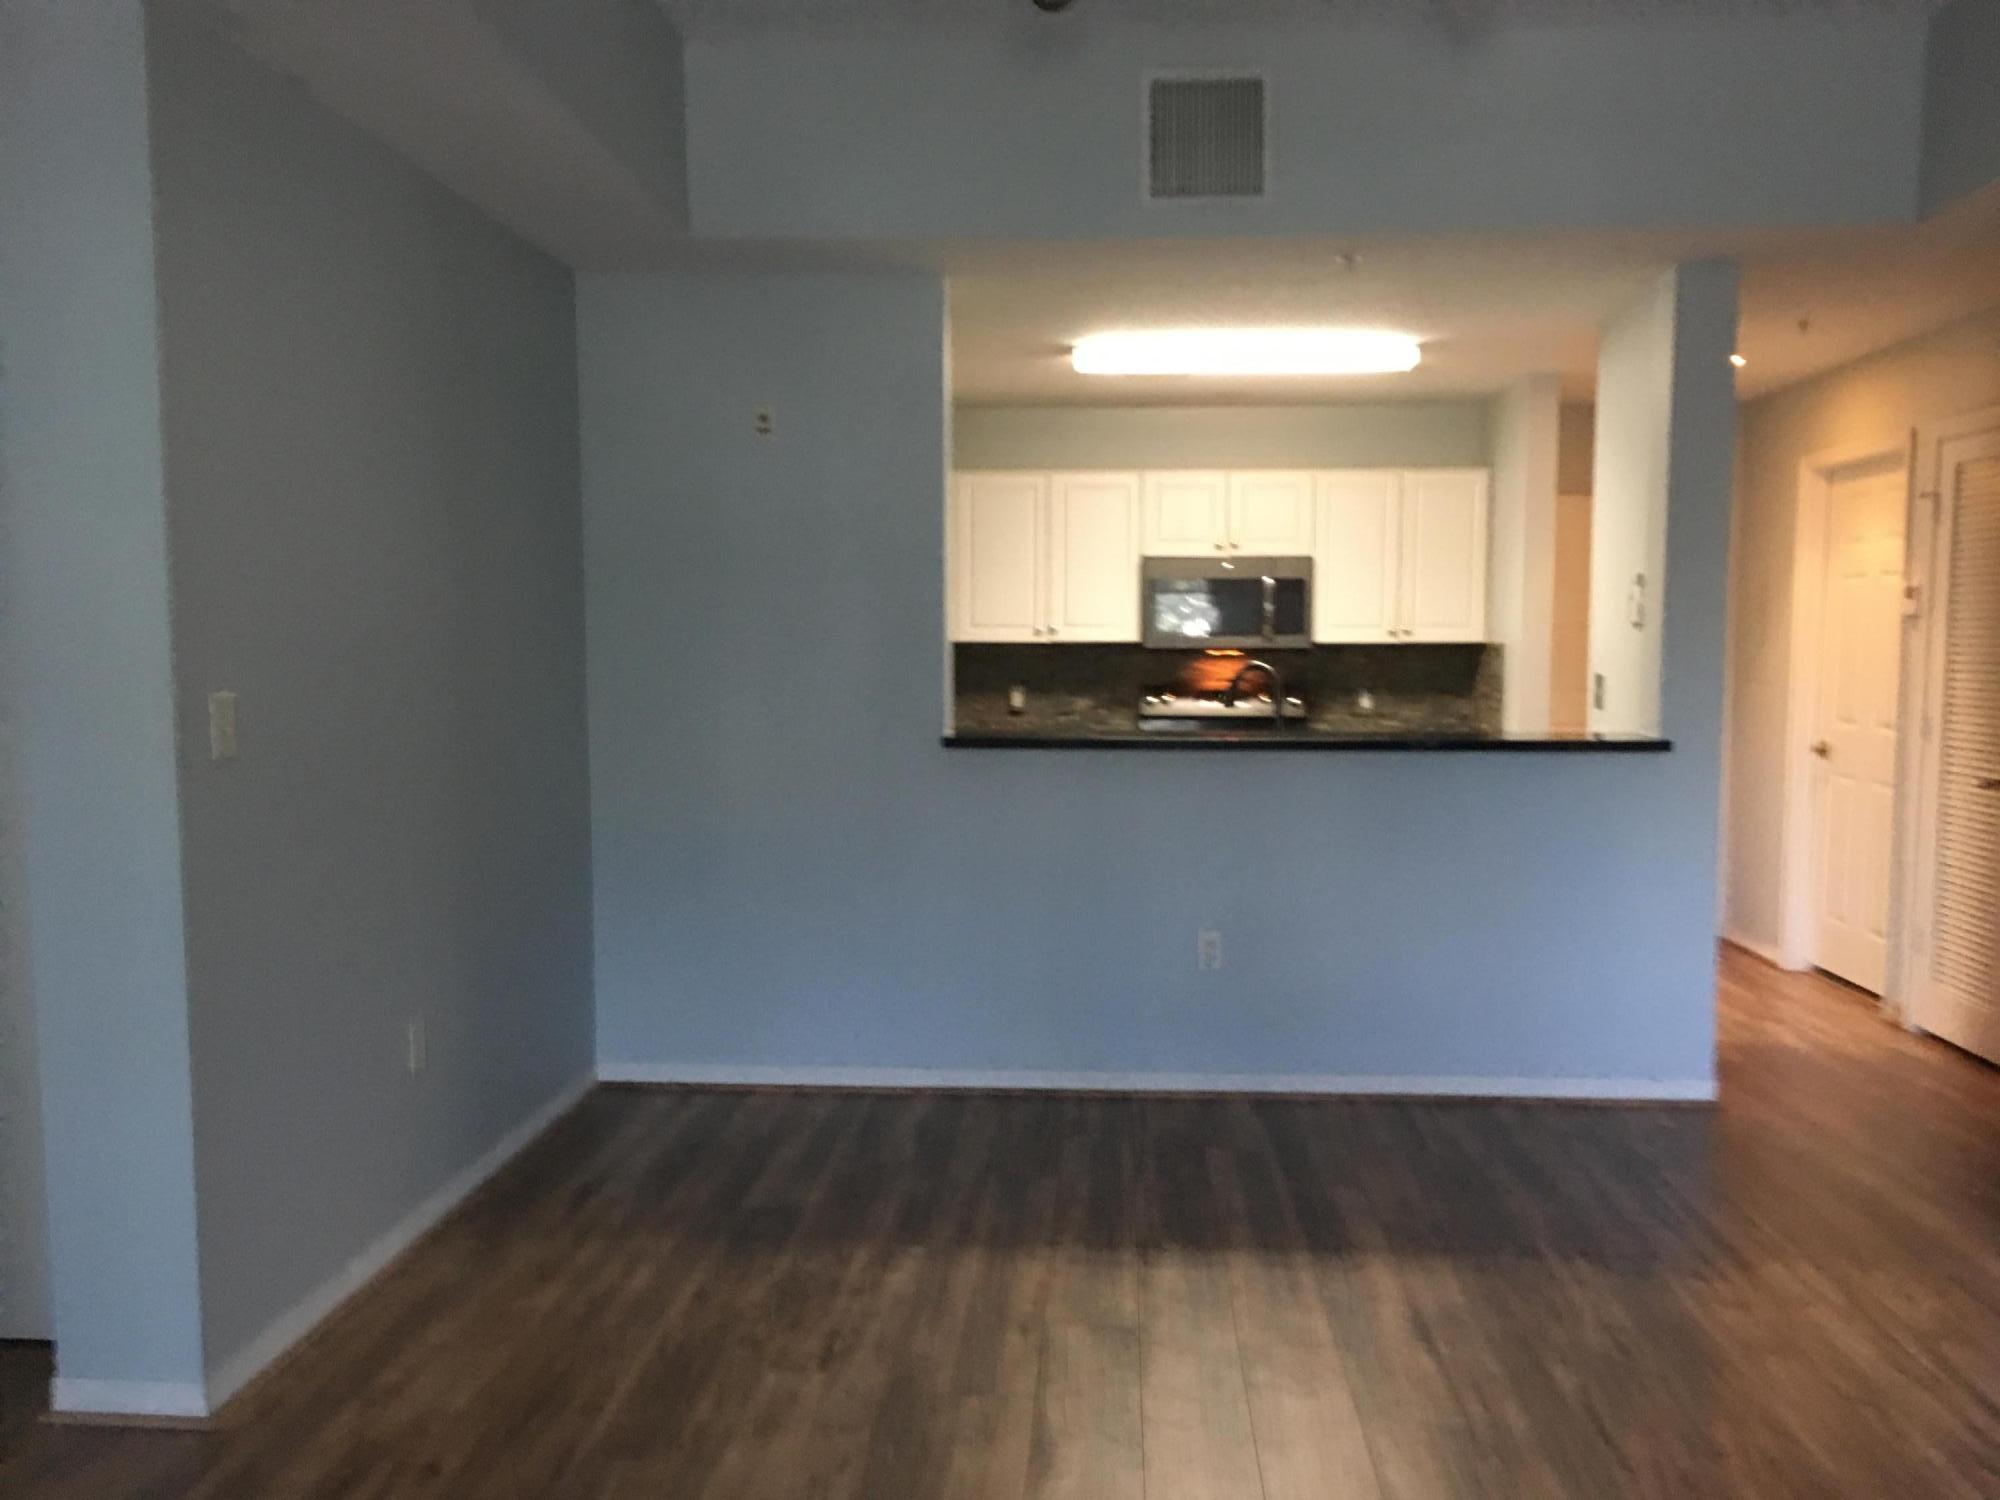 1209 Main Street 201, Jupiter, Florida 33458, 2 Bedrooms Bedrooms, ,2 BathroomsBathrooms,A,Condominium,Main,RX-10500367